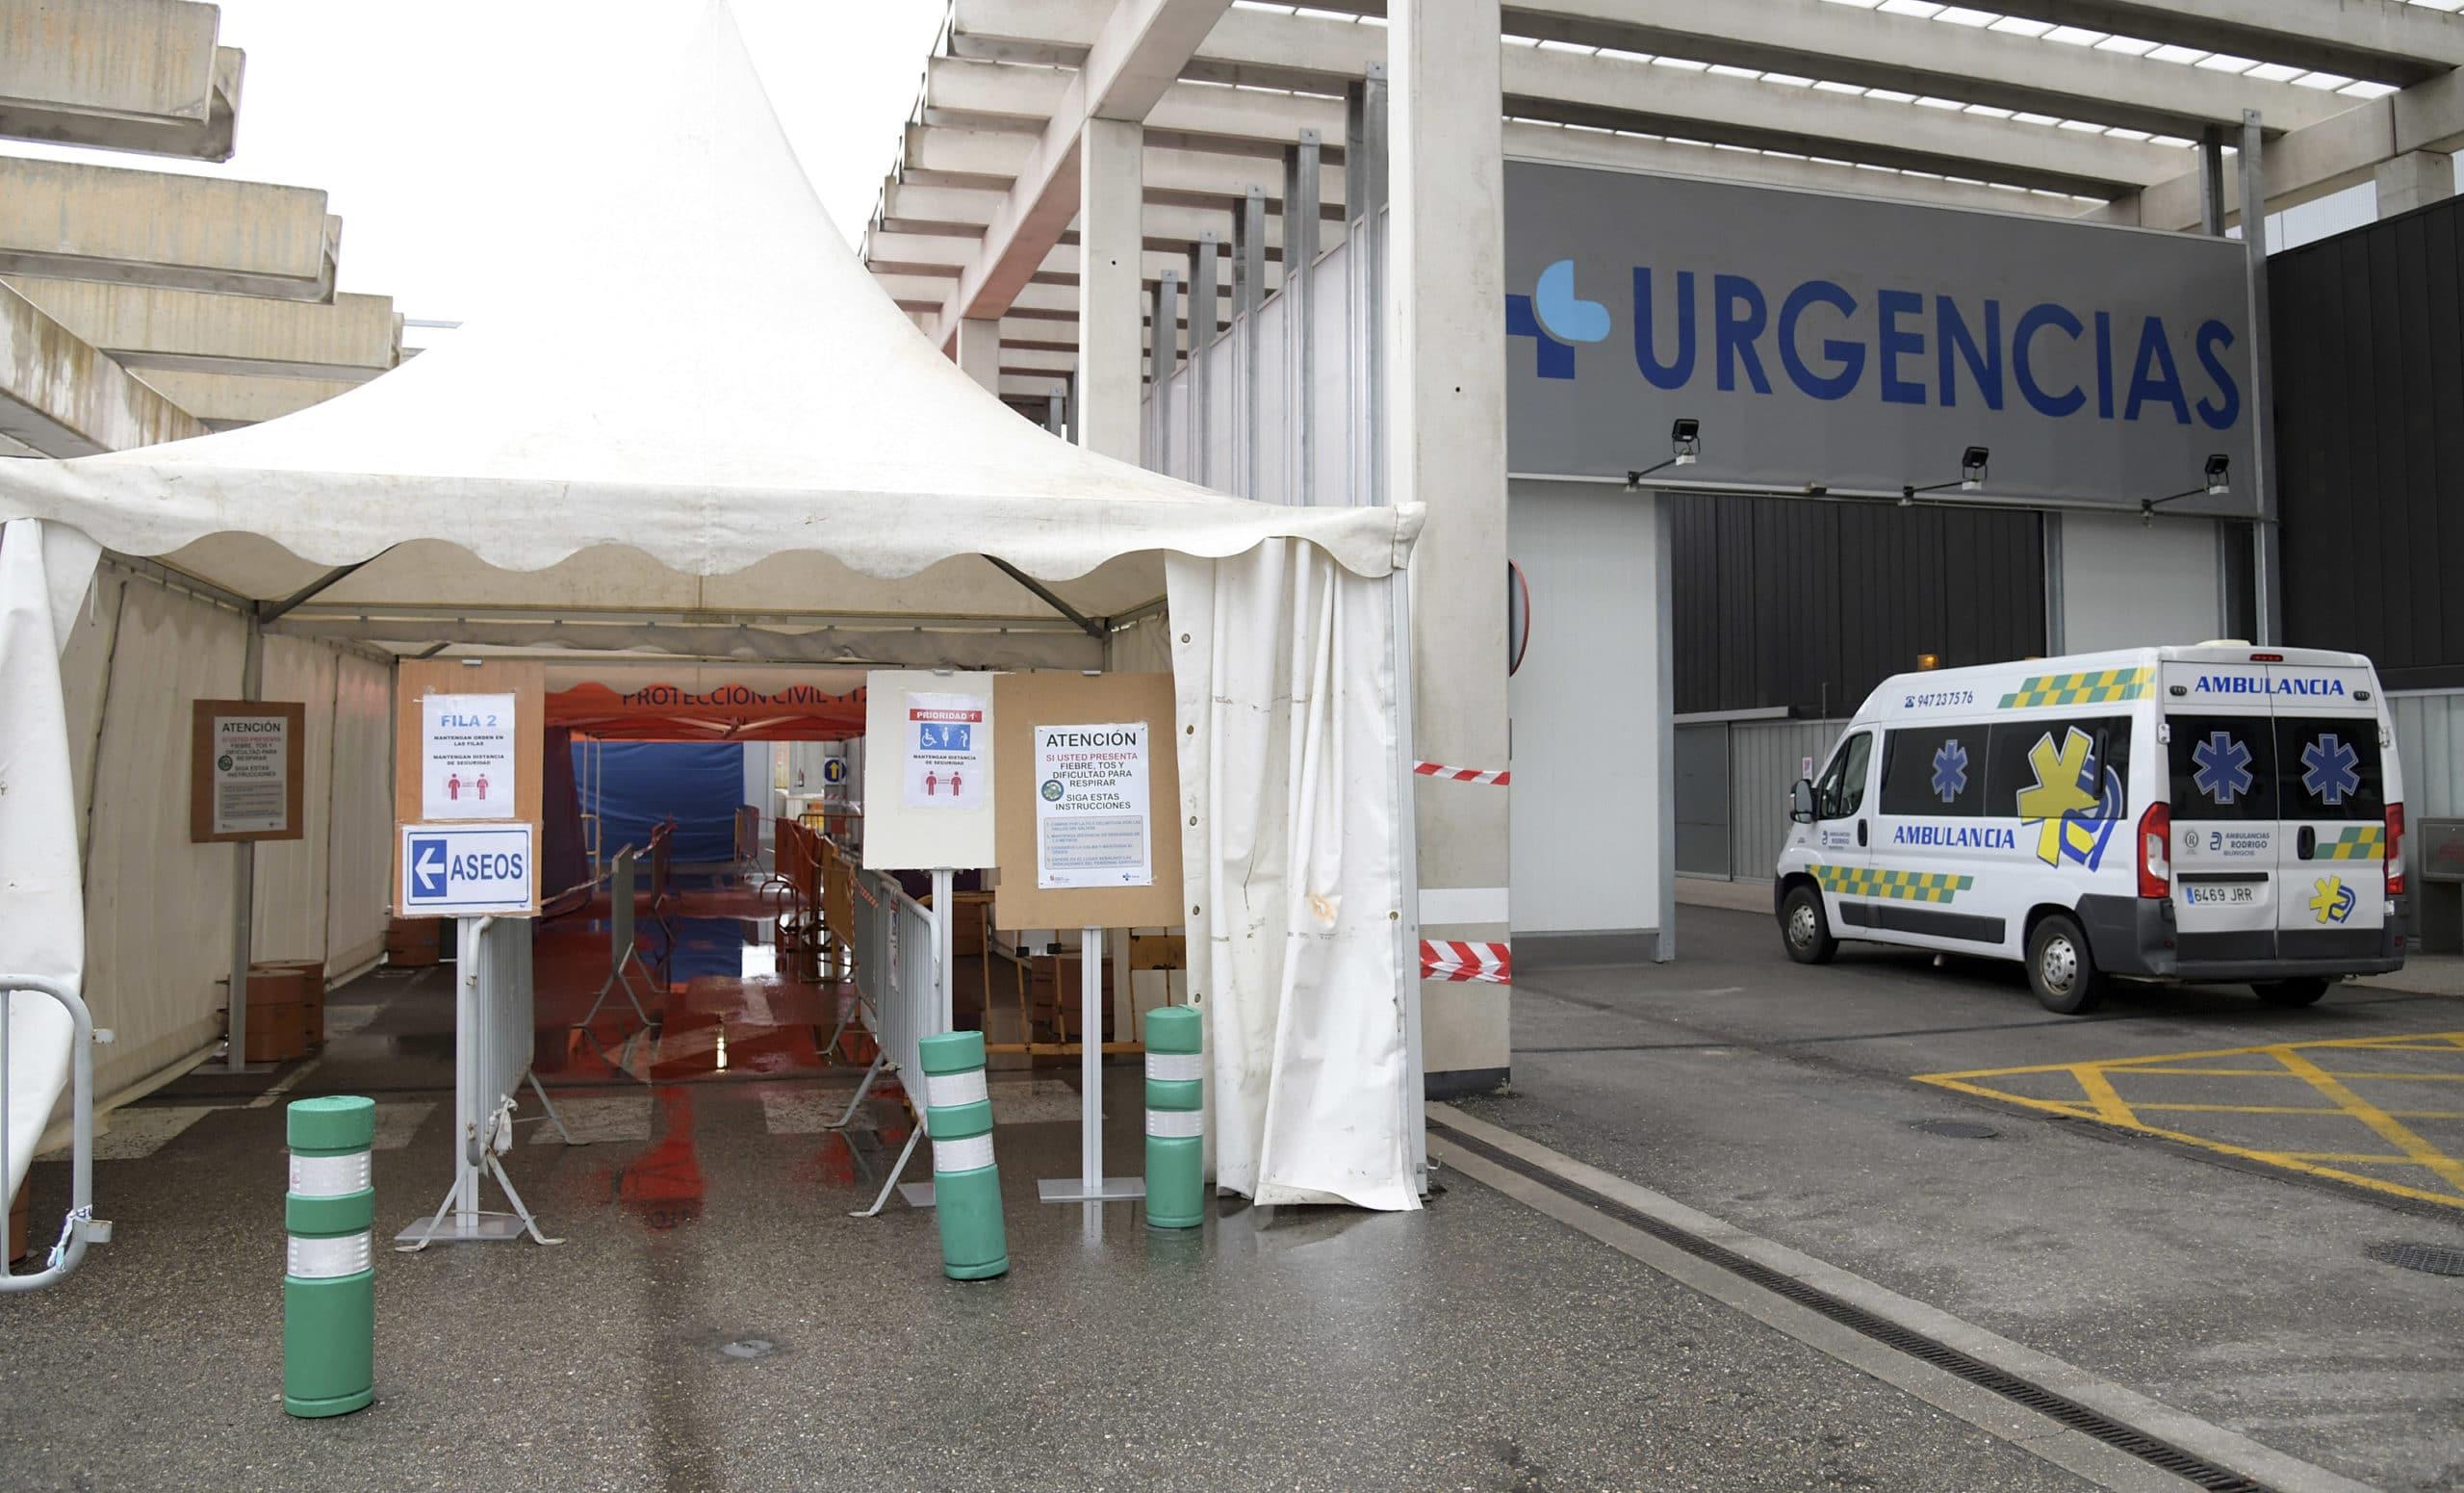 Fundación Caja Rural dona 100.000 euros al Hospital Universitario de Burgos